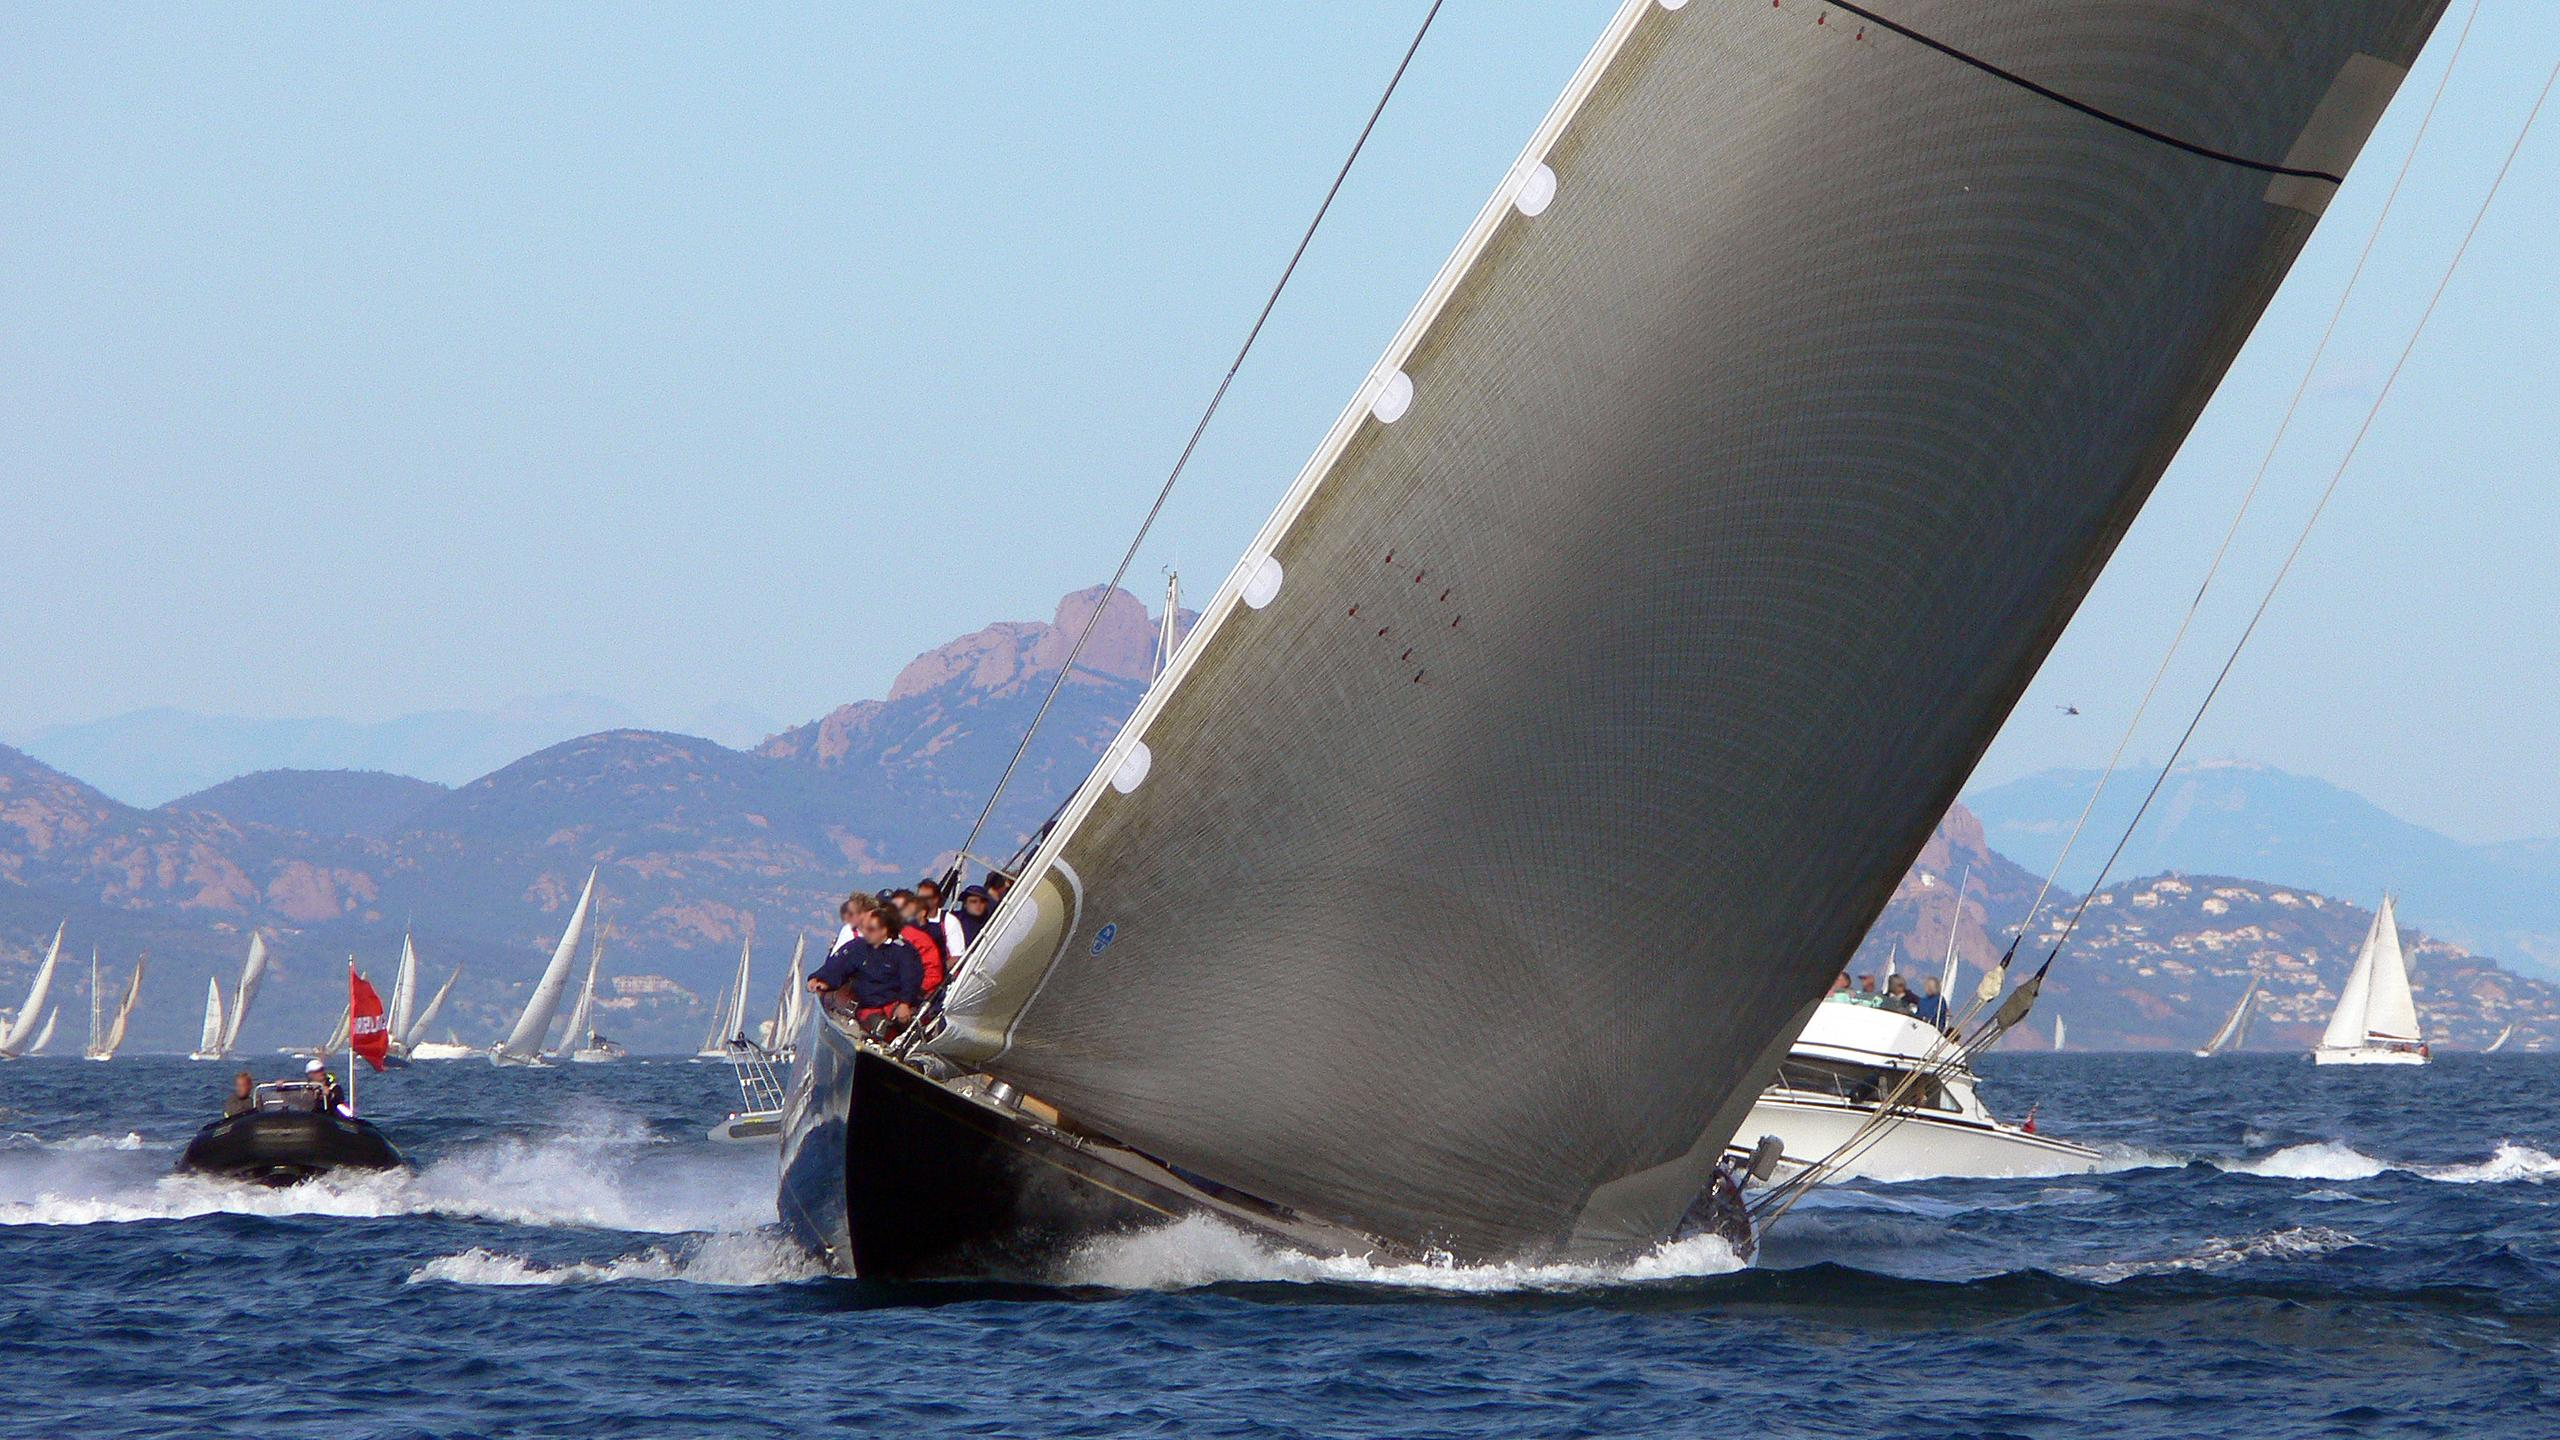 velsheda-sailing-yacht-camper-nicholsons-1933-38m-cruising-bow